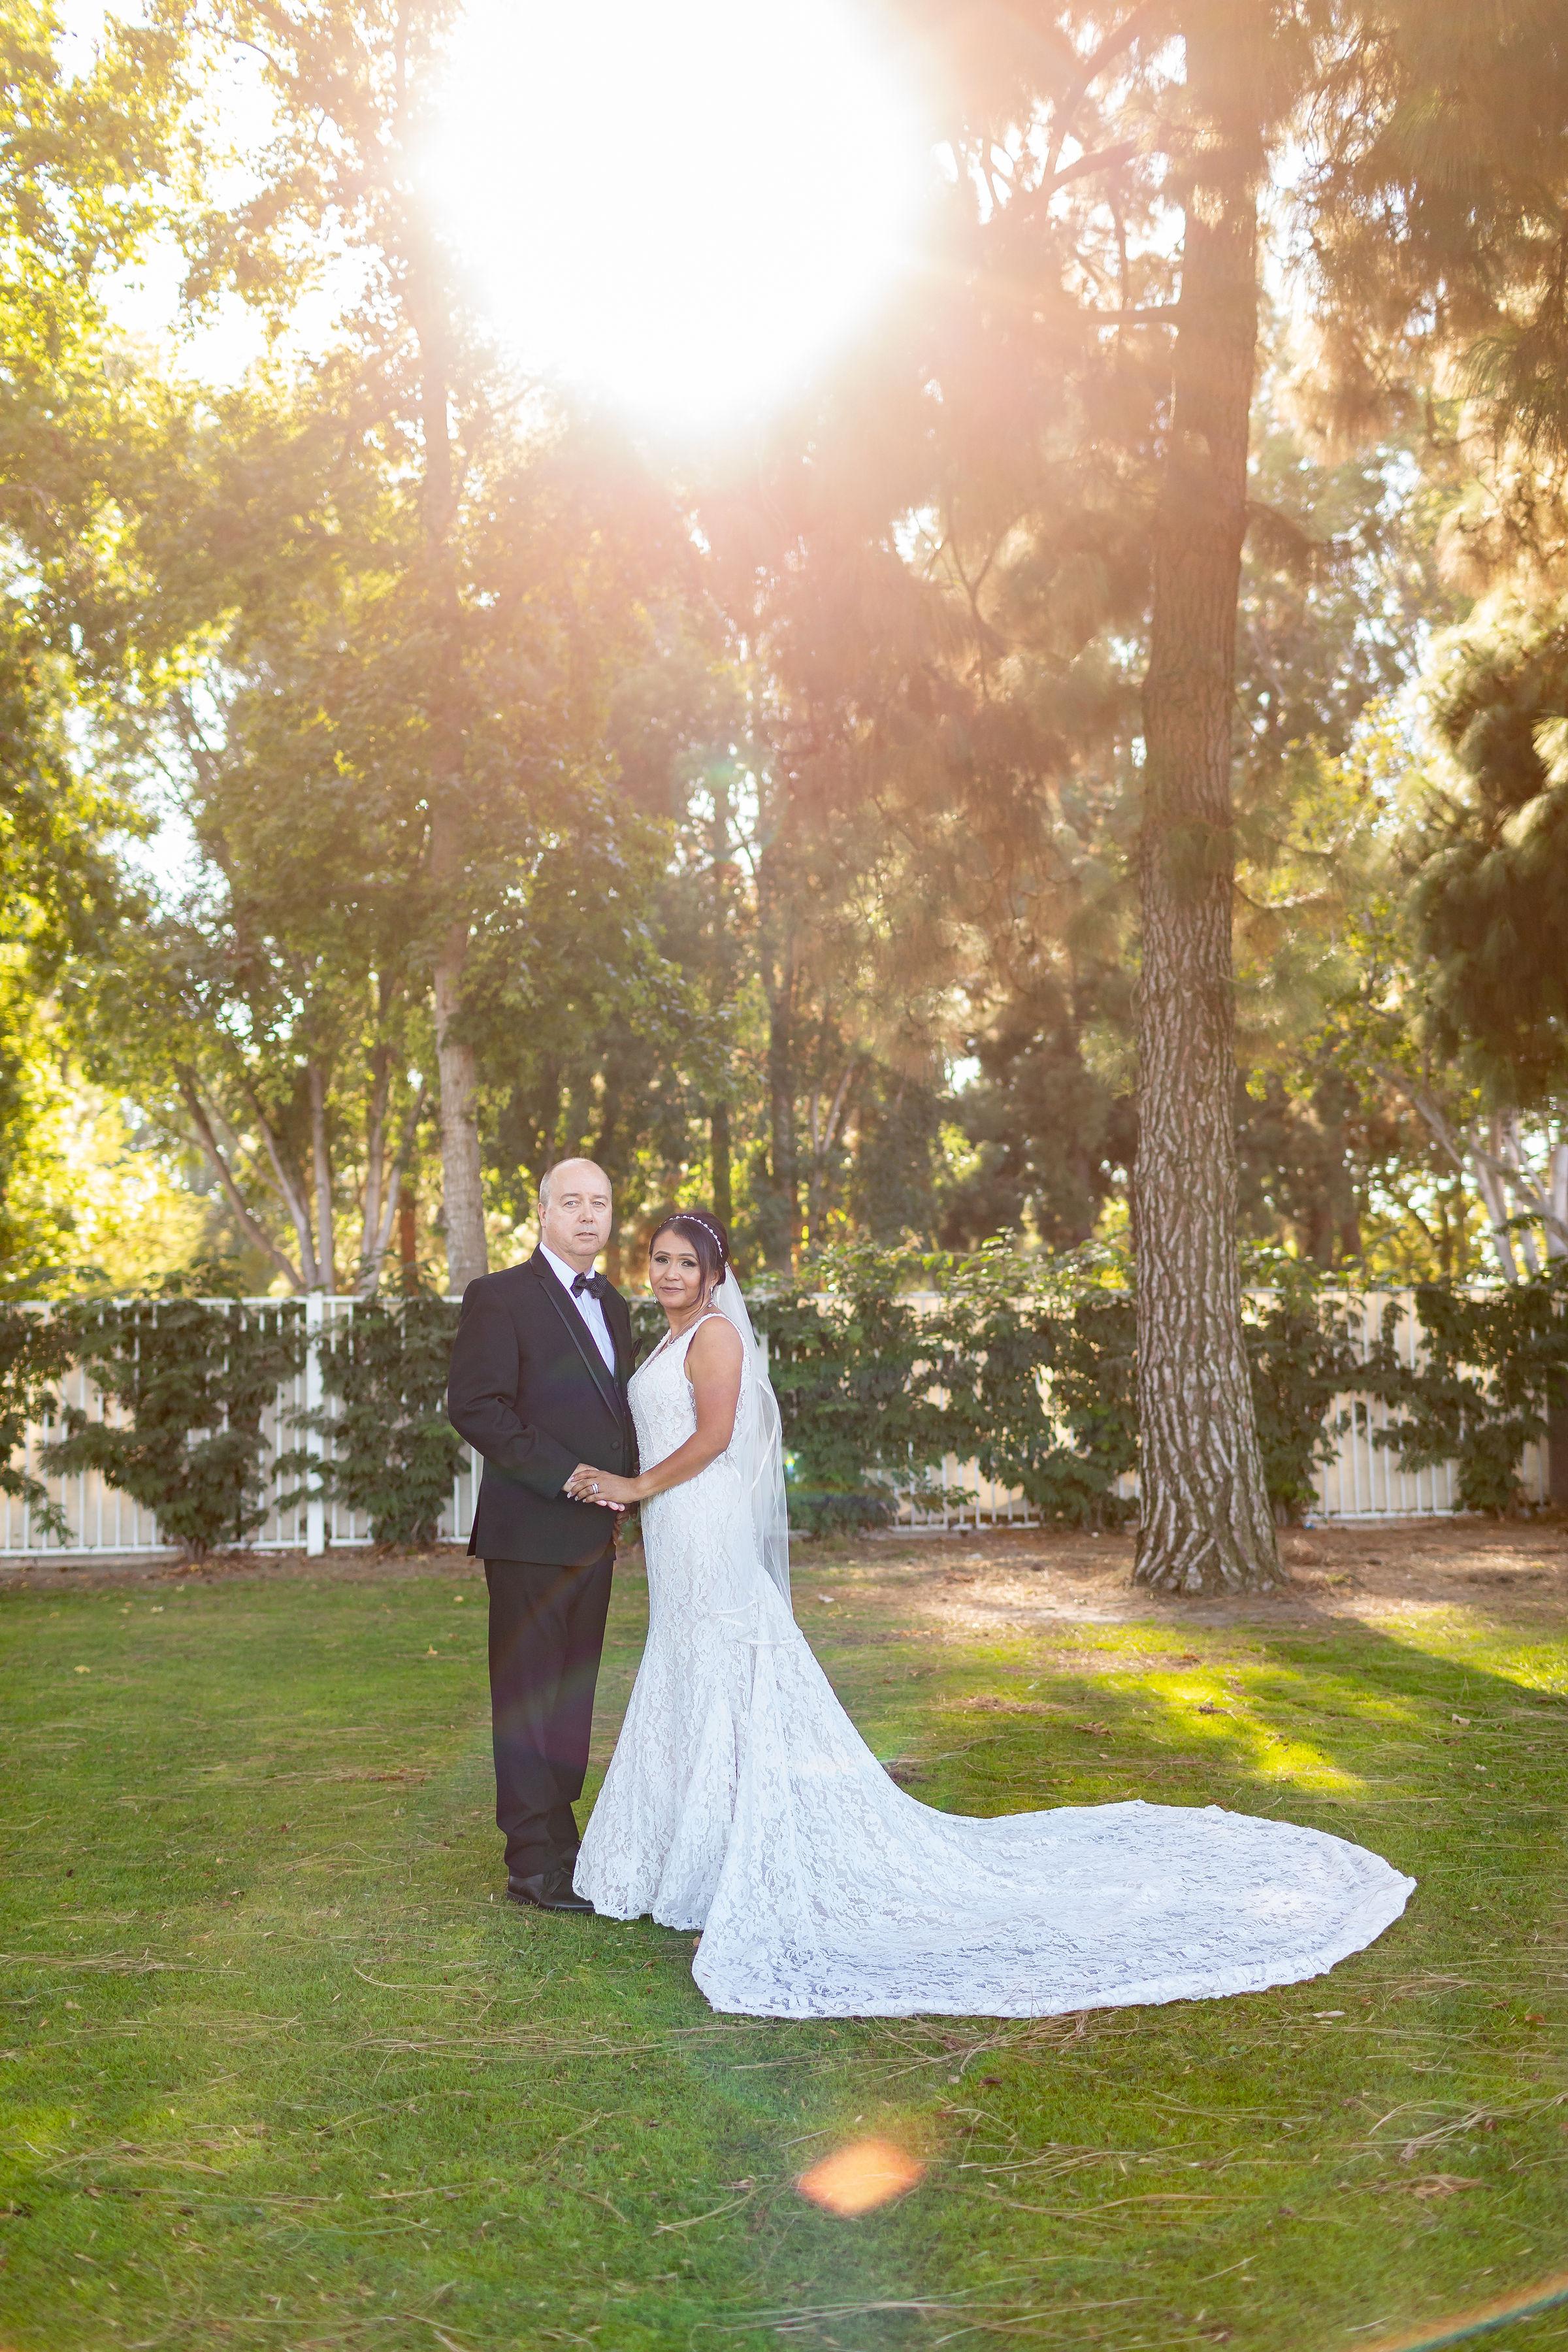 ! Long Beach El Dorado Wedding Portraits by James Korin Photography.jpg